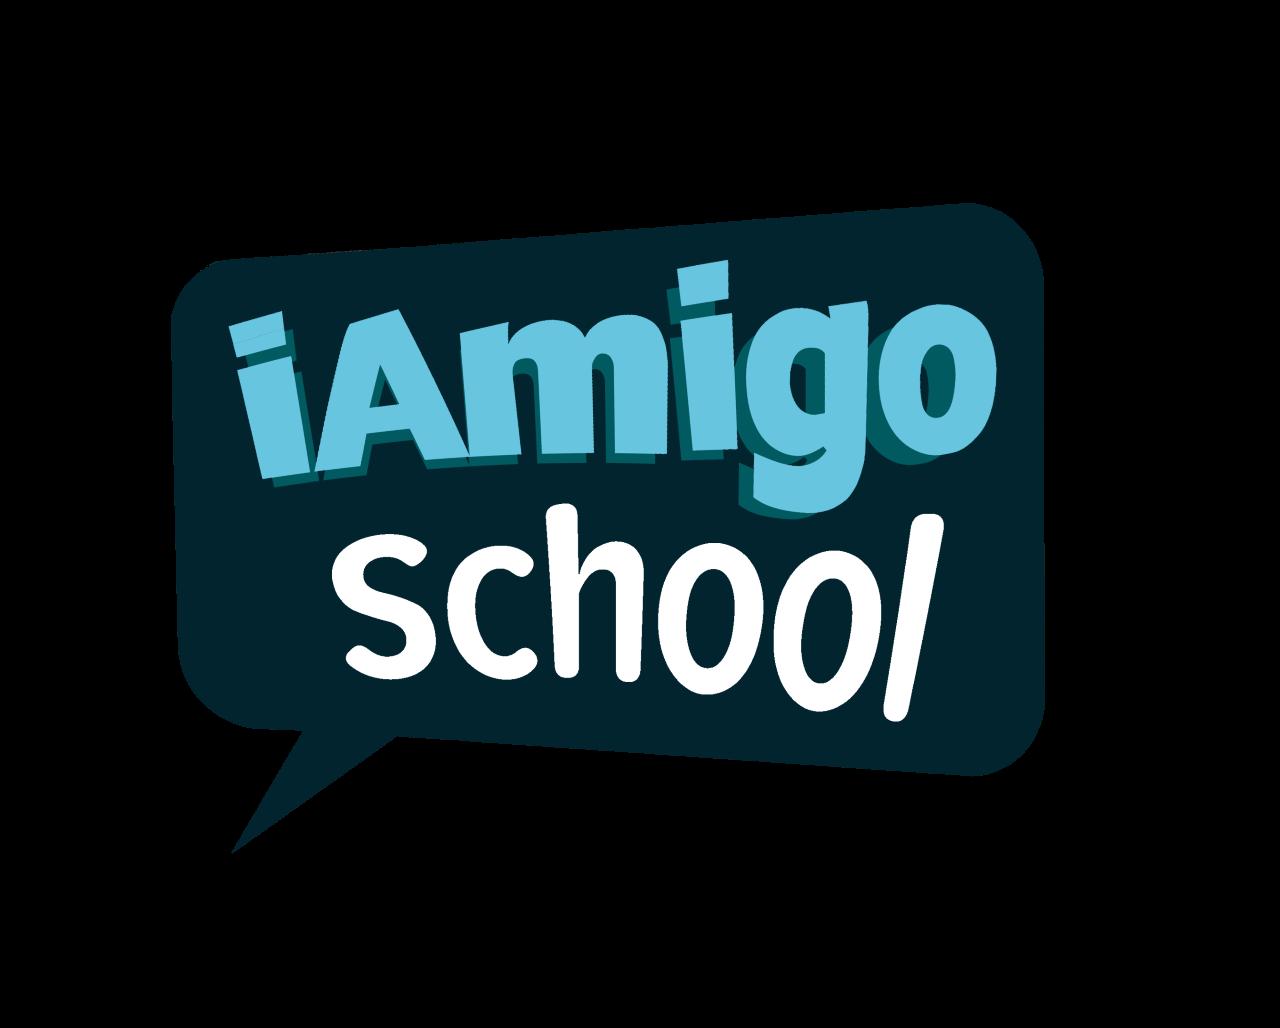 iAmigoSchool